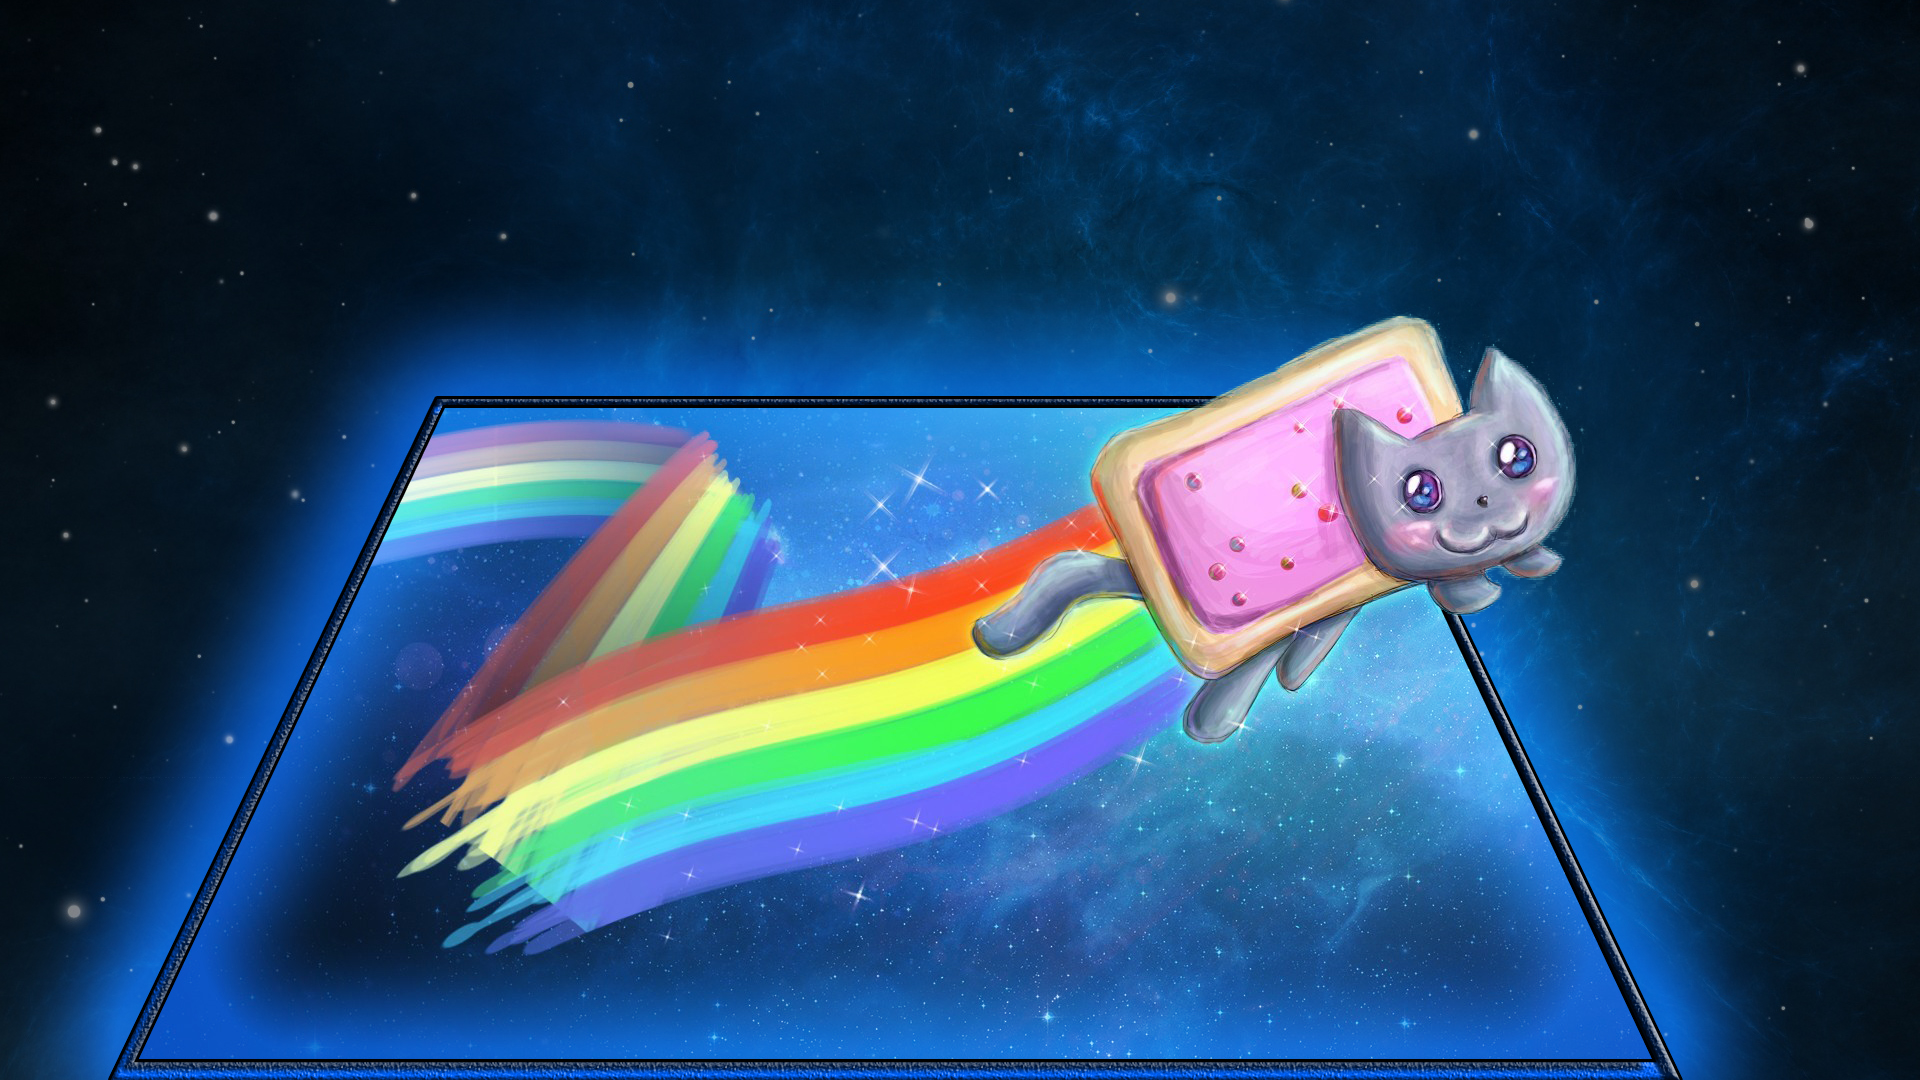 rainbow cat wallpapers - photo #2